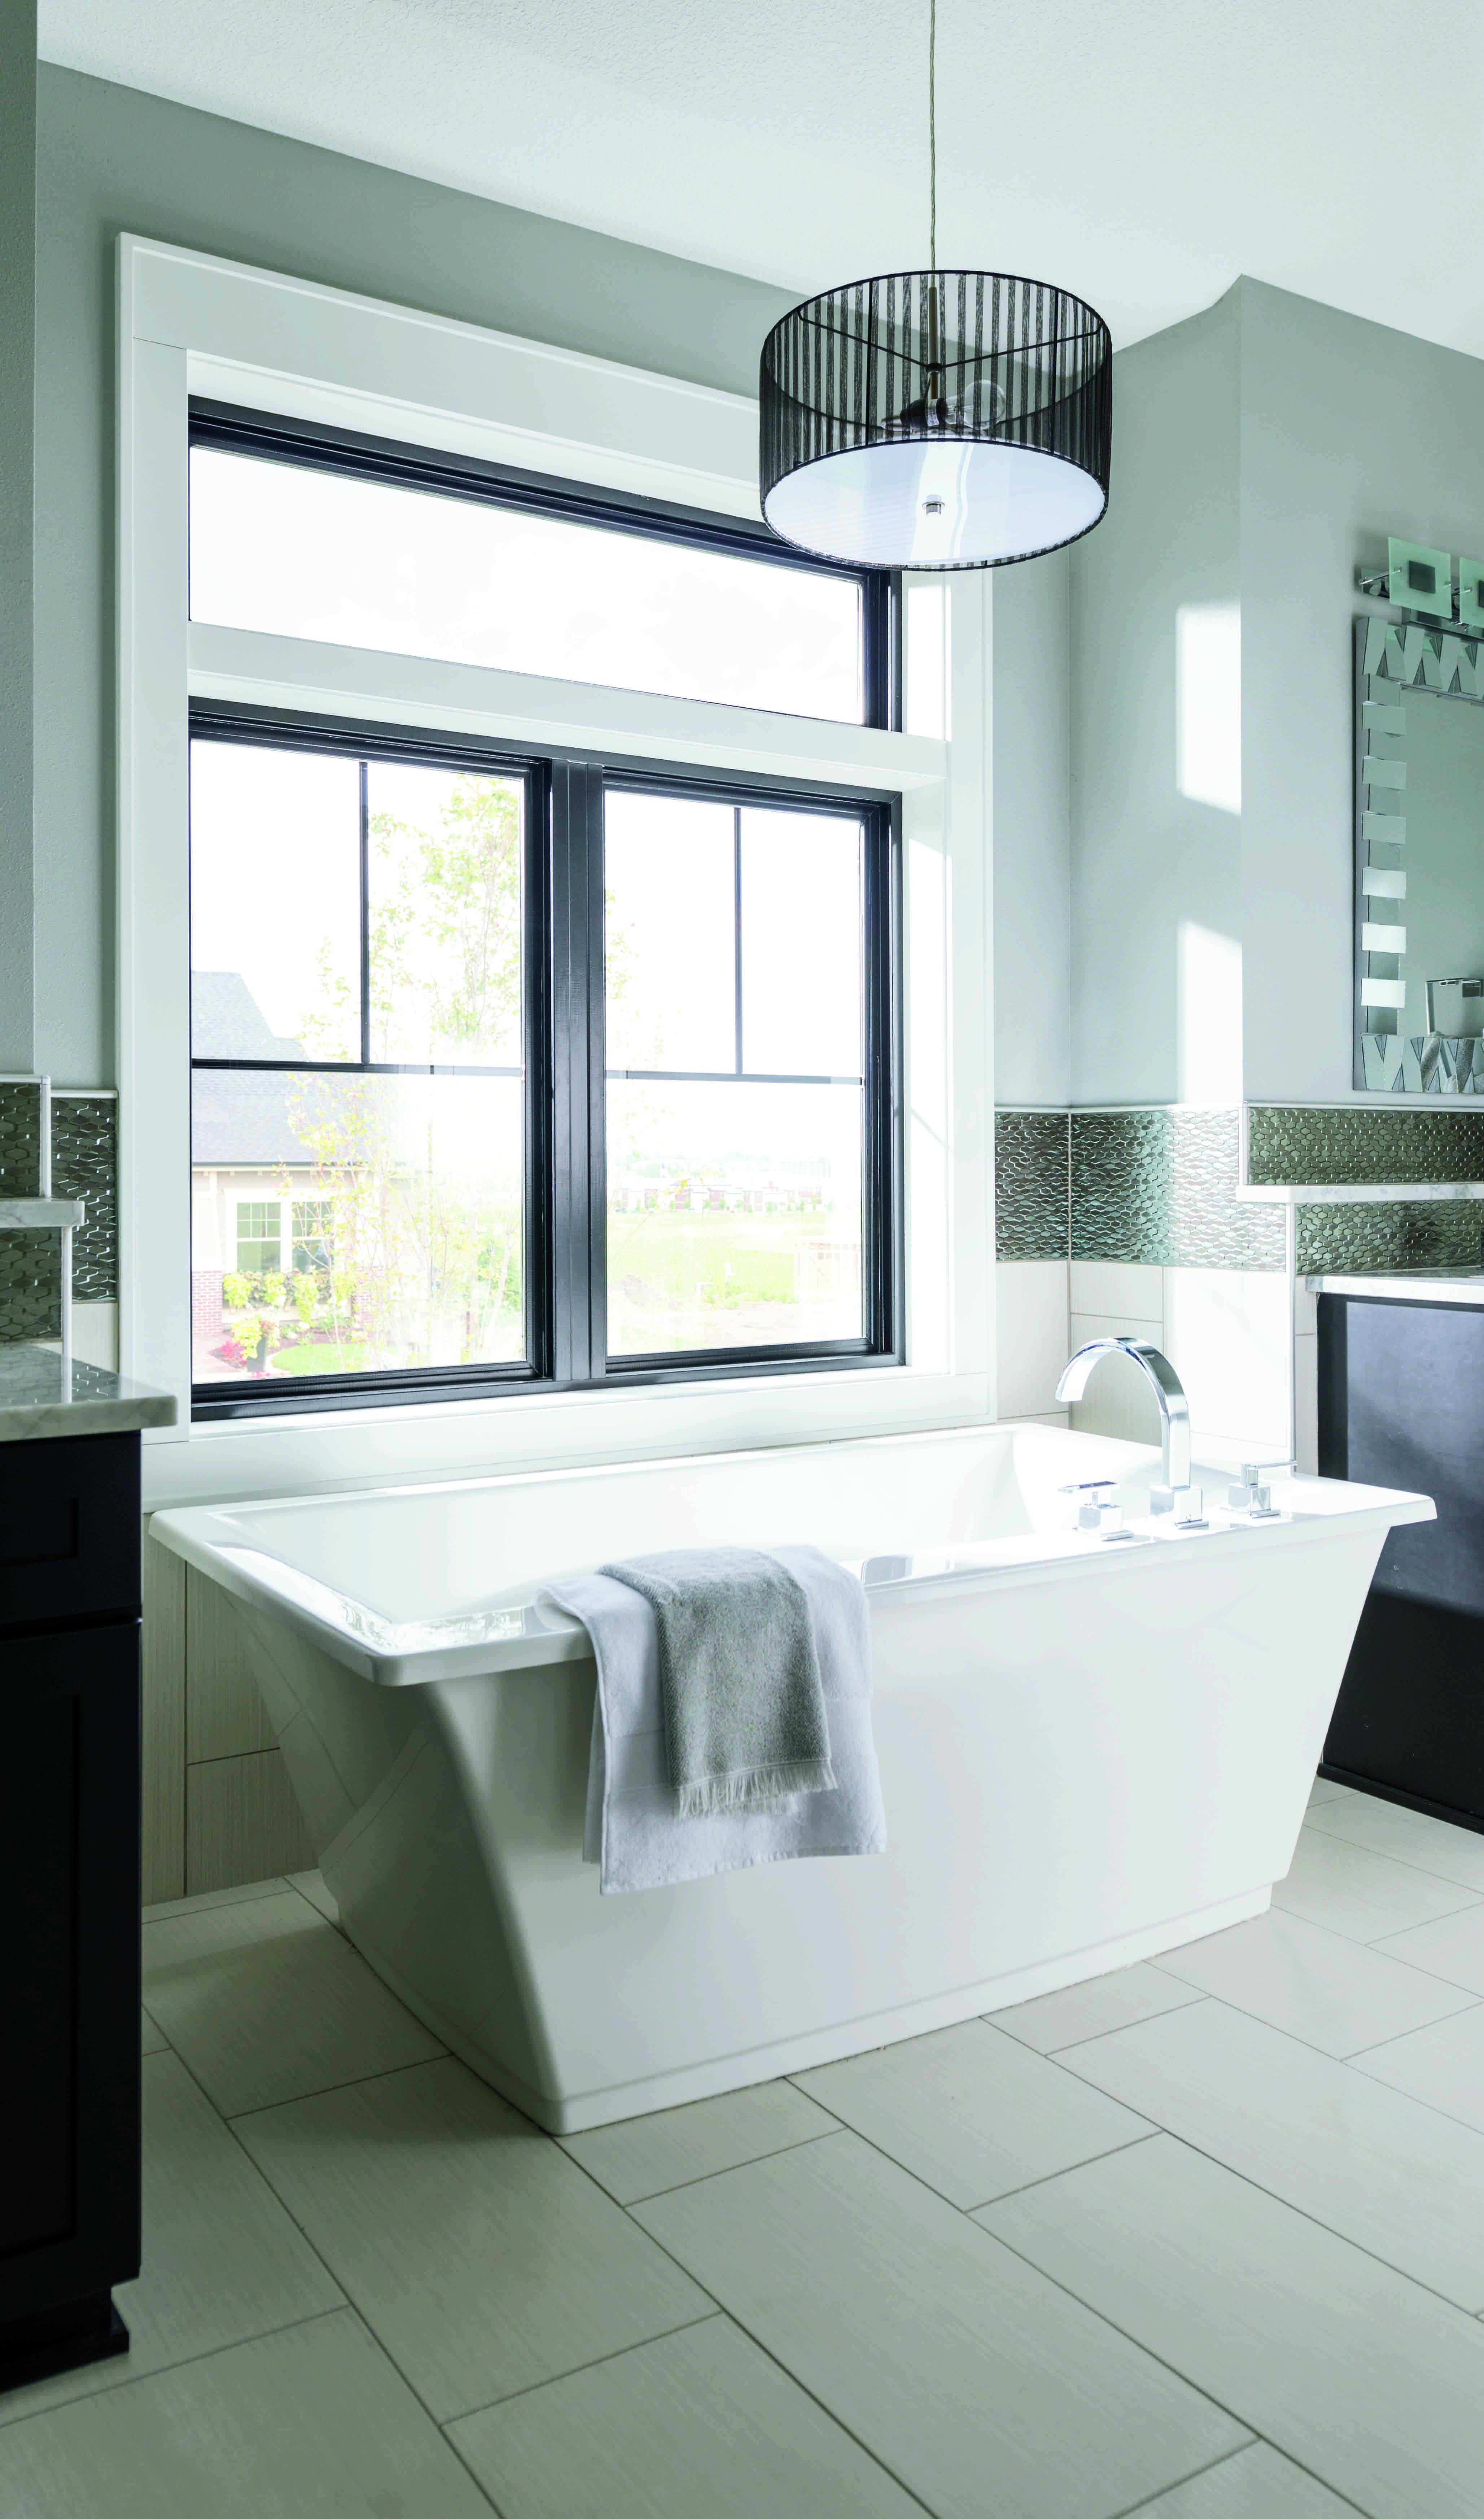 pella sliding windows transform your bathroom view with pella impervia sliding window window